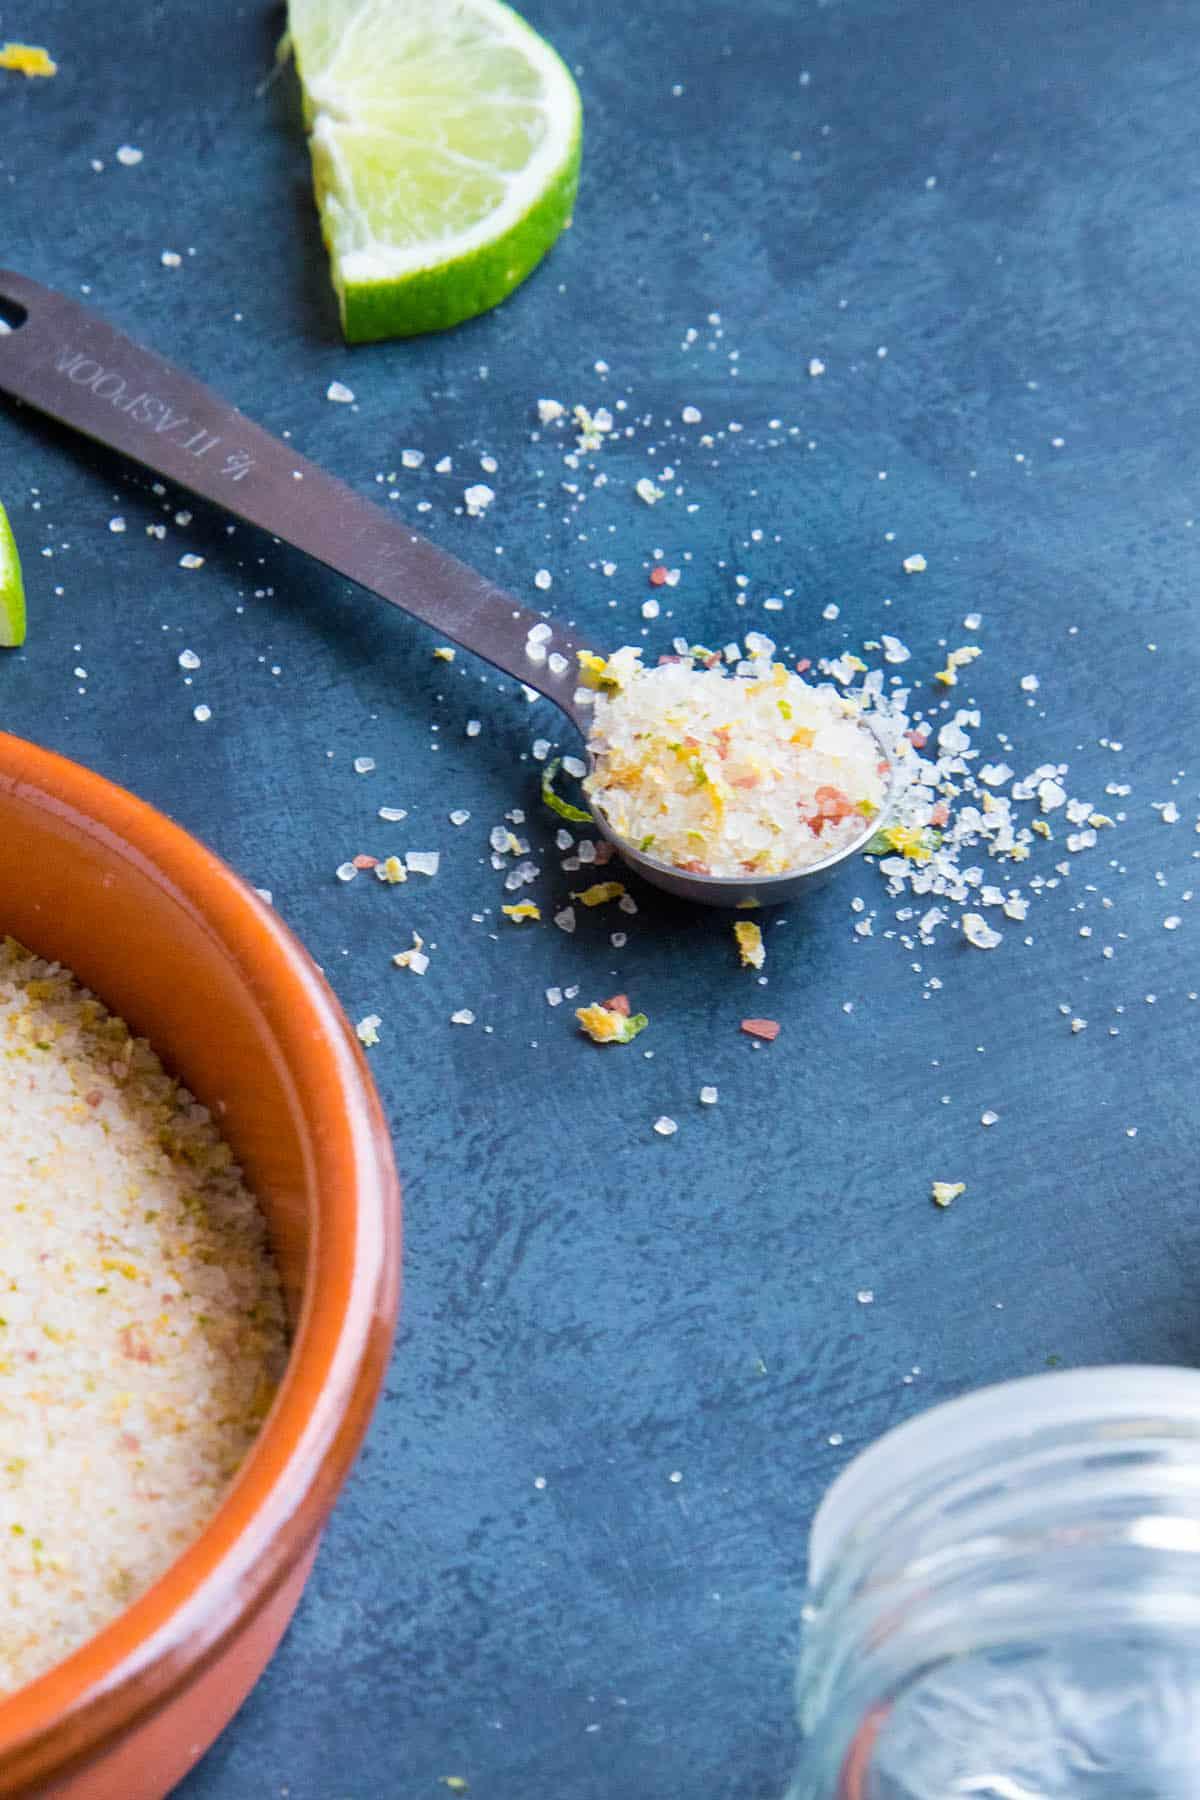 Citrus Lemon and Lime Salt in a serving spoon